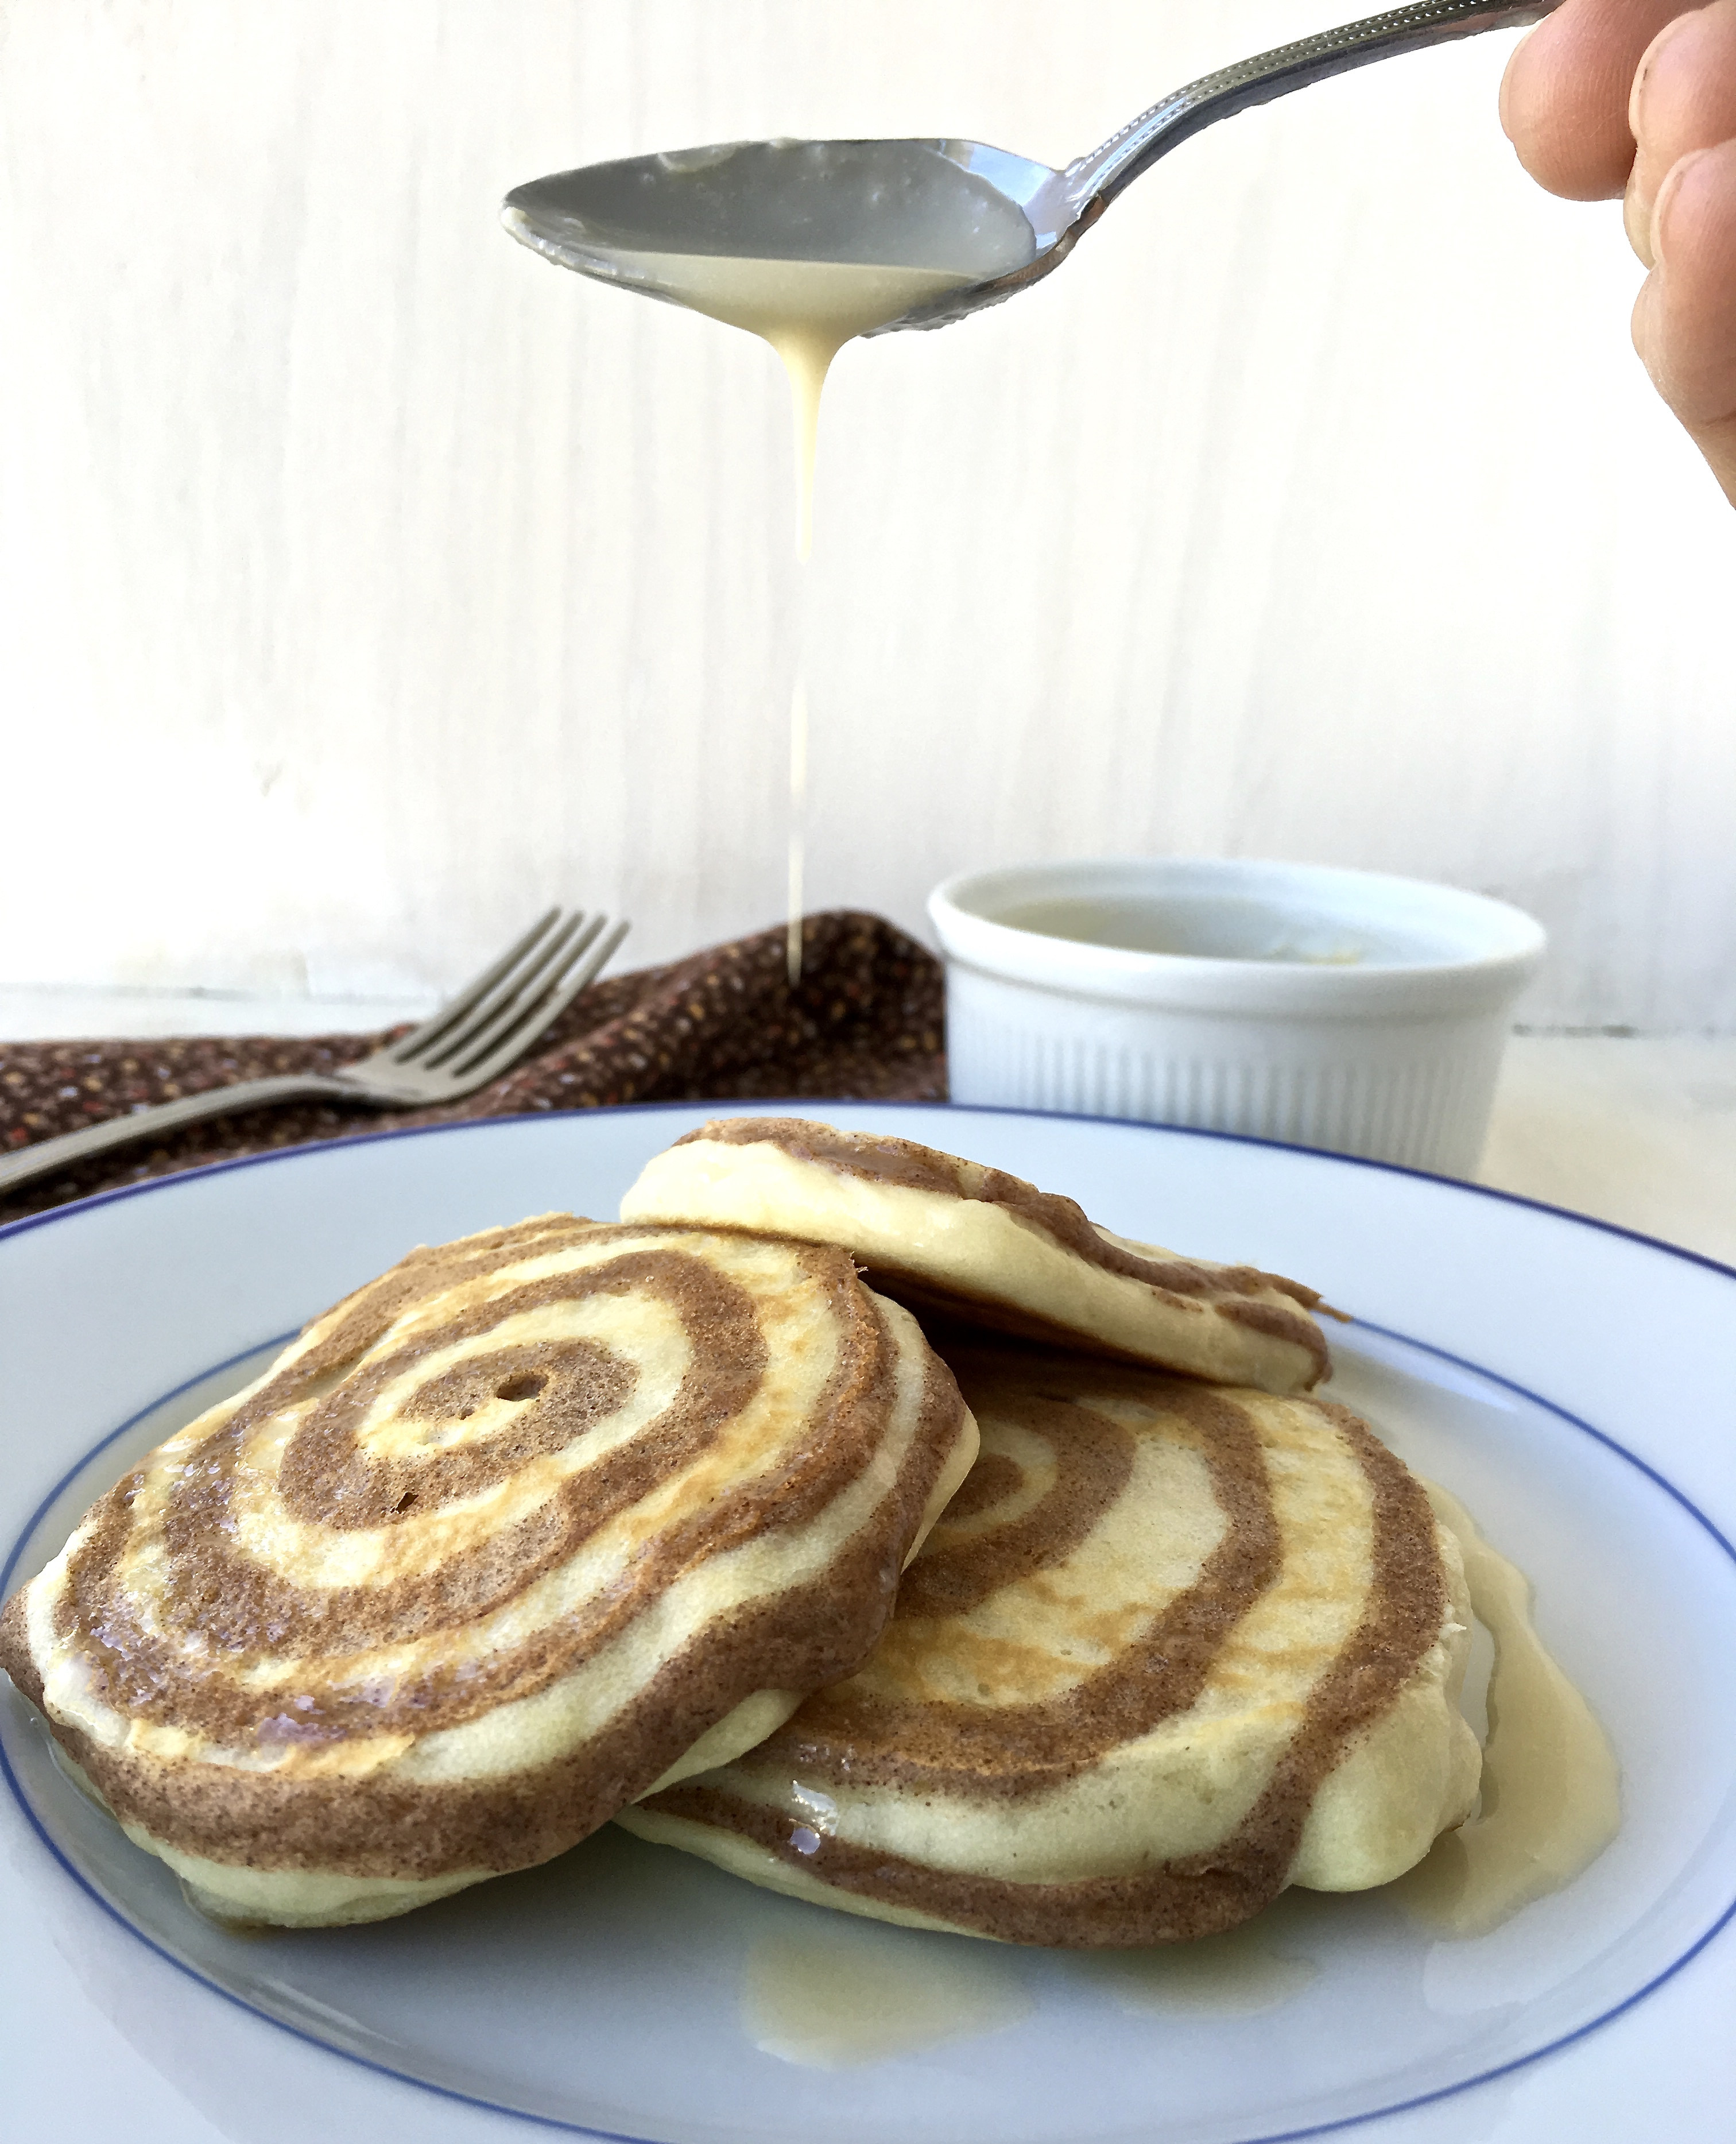 cinnabon pancakes and syrup